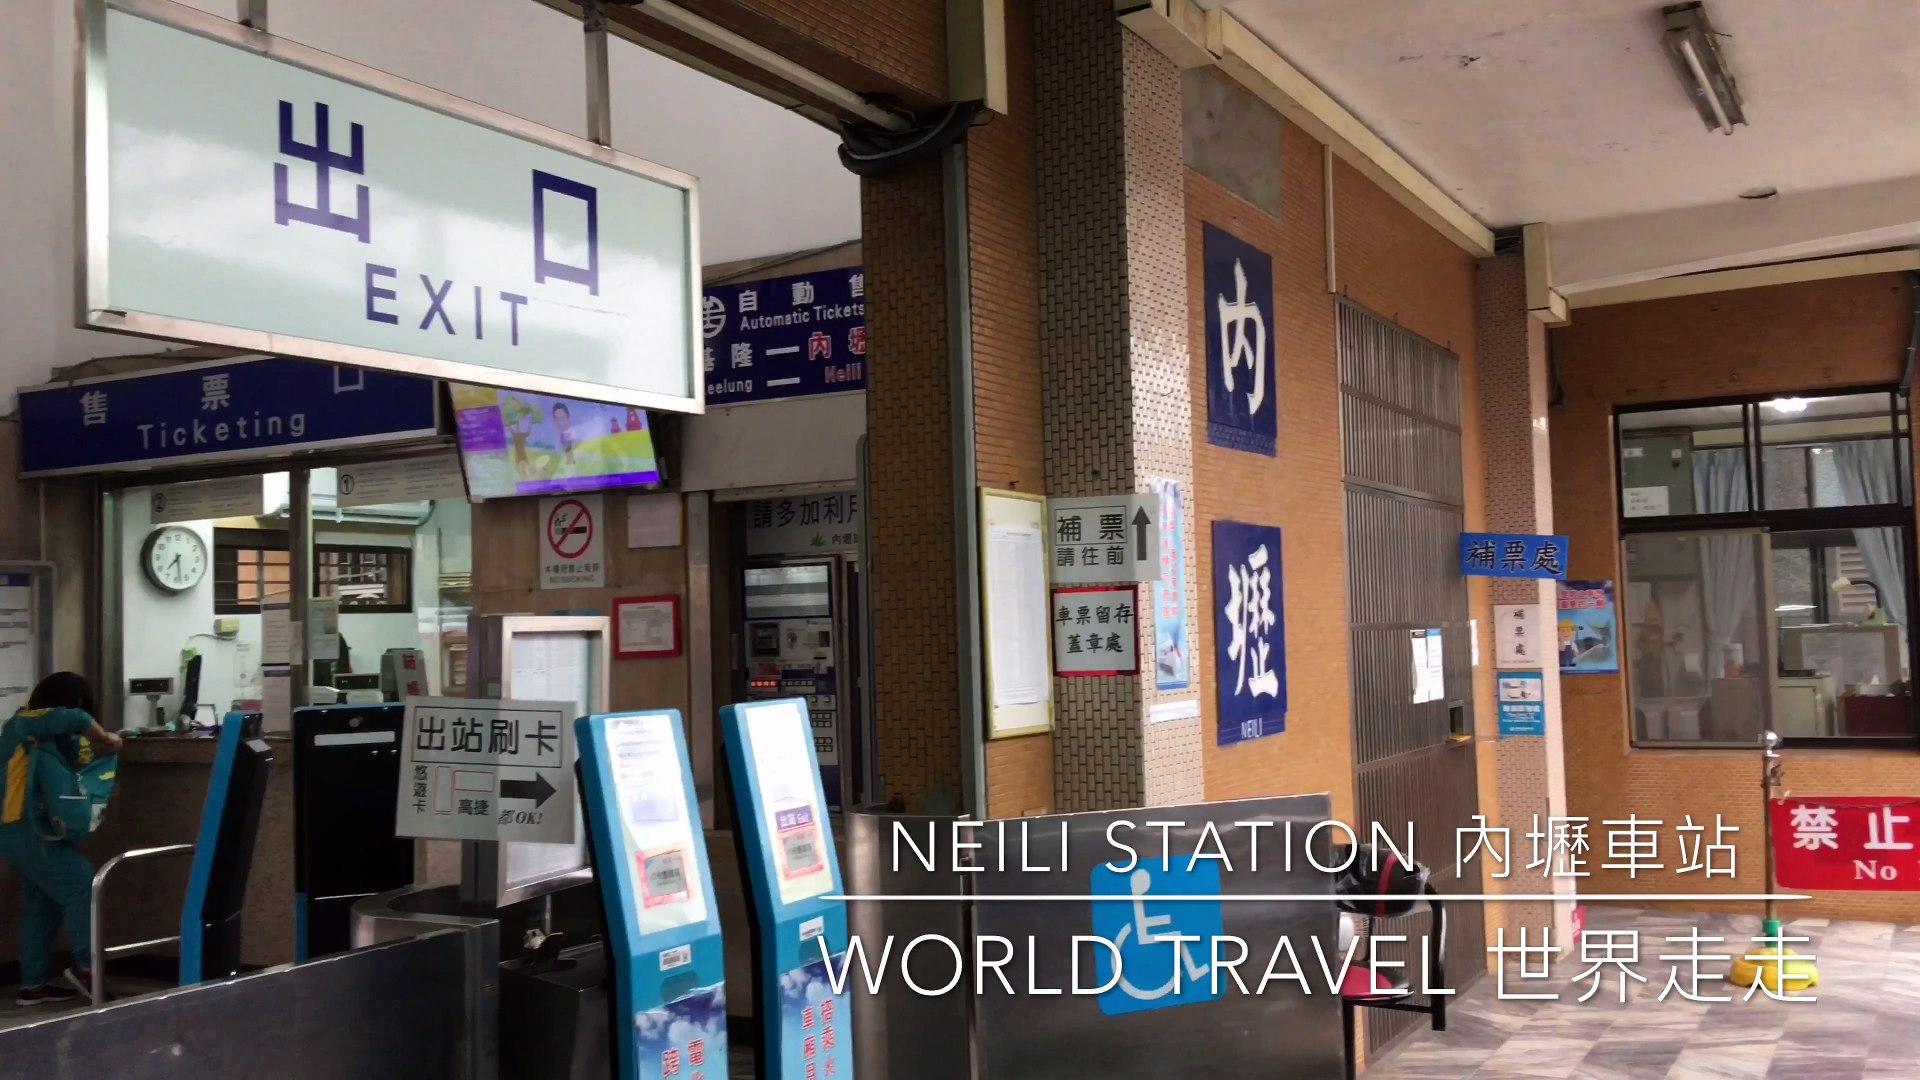 Neili Station 內壢車站 World Travel 世界走走